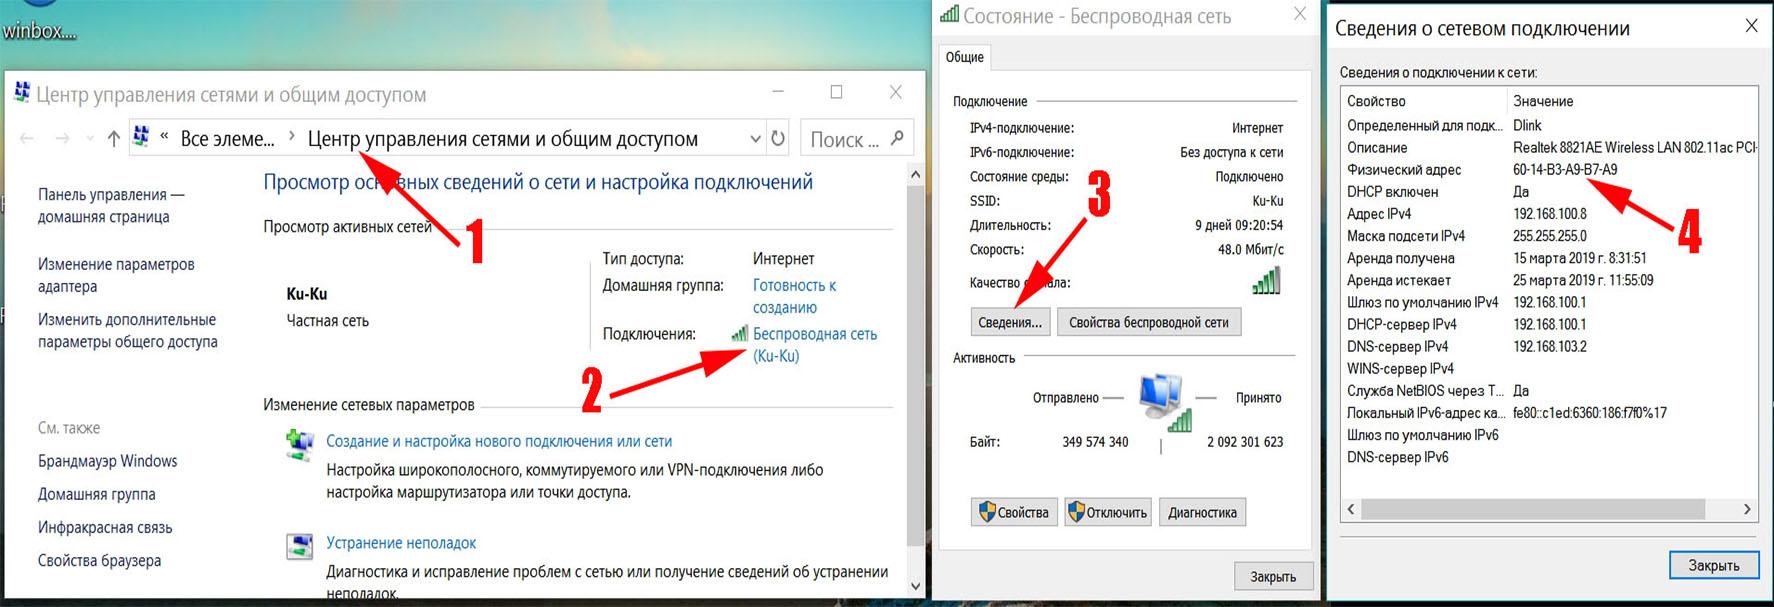 Как посмотреть MAC адрес WiFi на компьютере Windows 10, 7